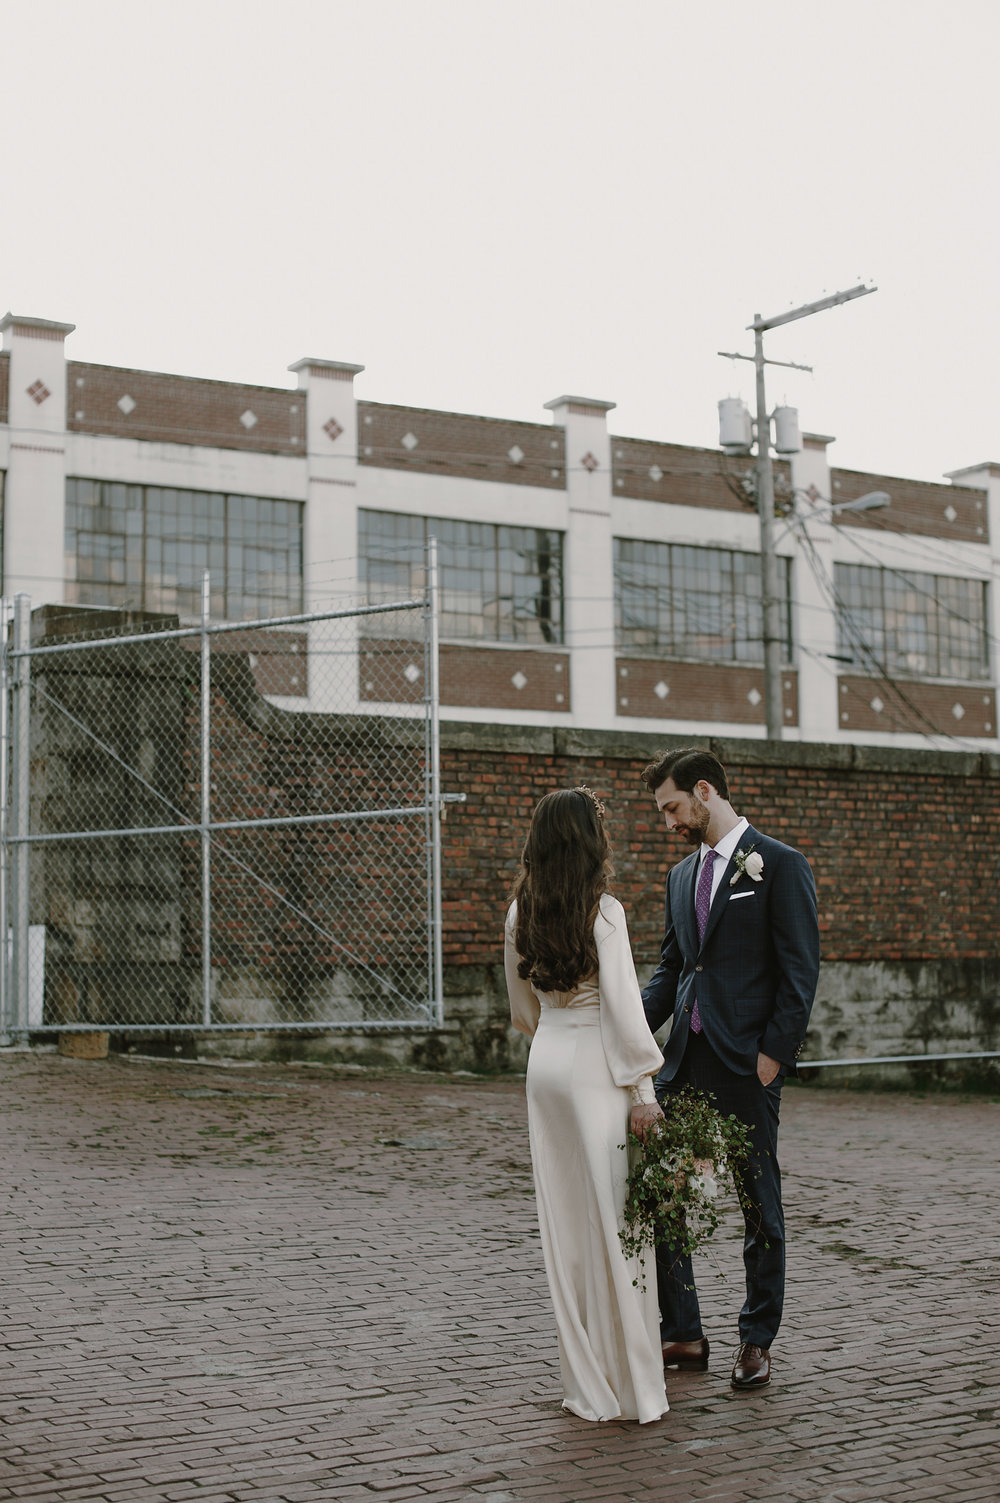 kristenmarieparker_tacoma_conservatory_warehouse_wedding075.JPG